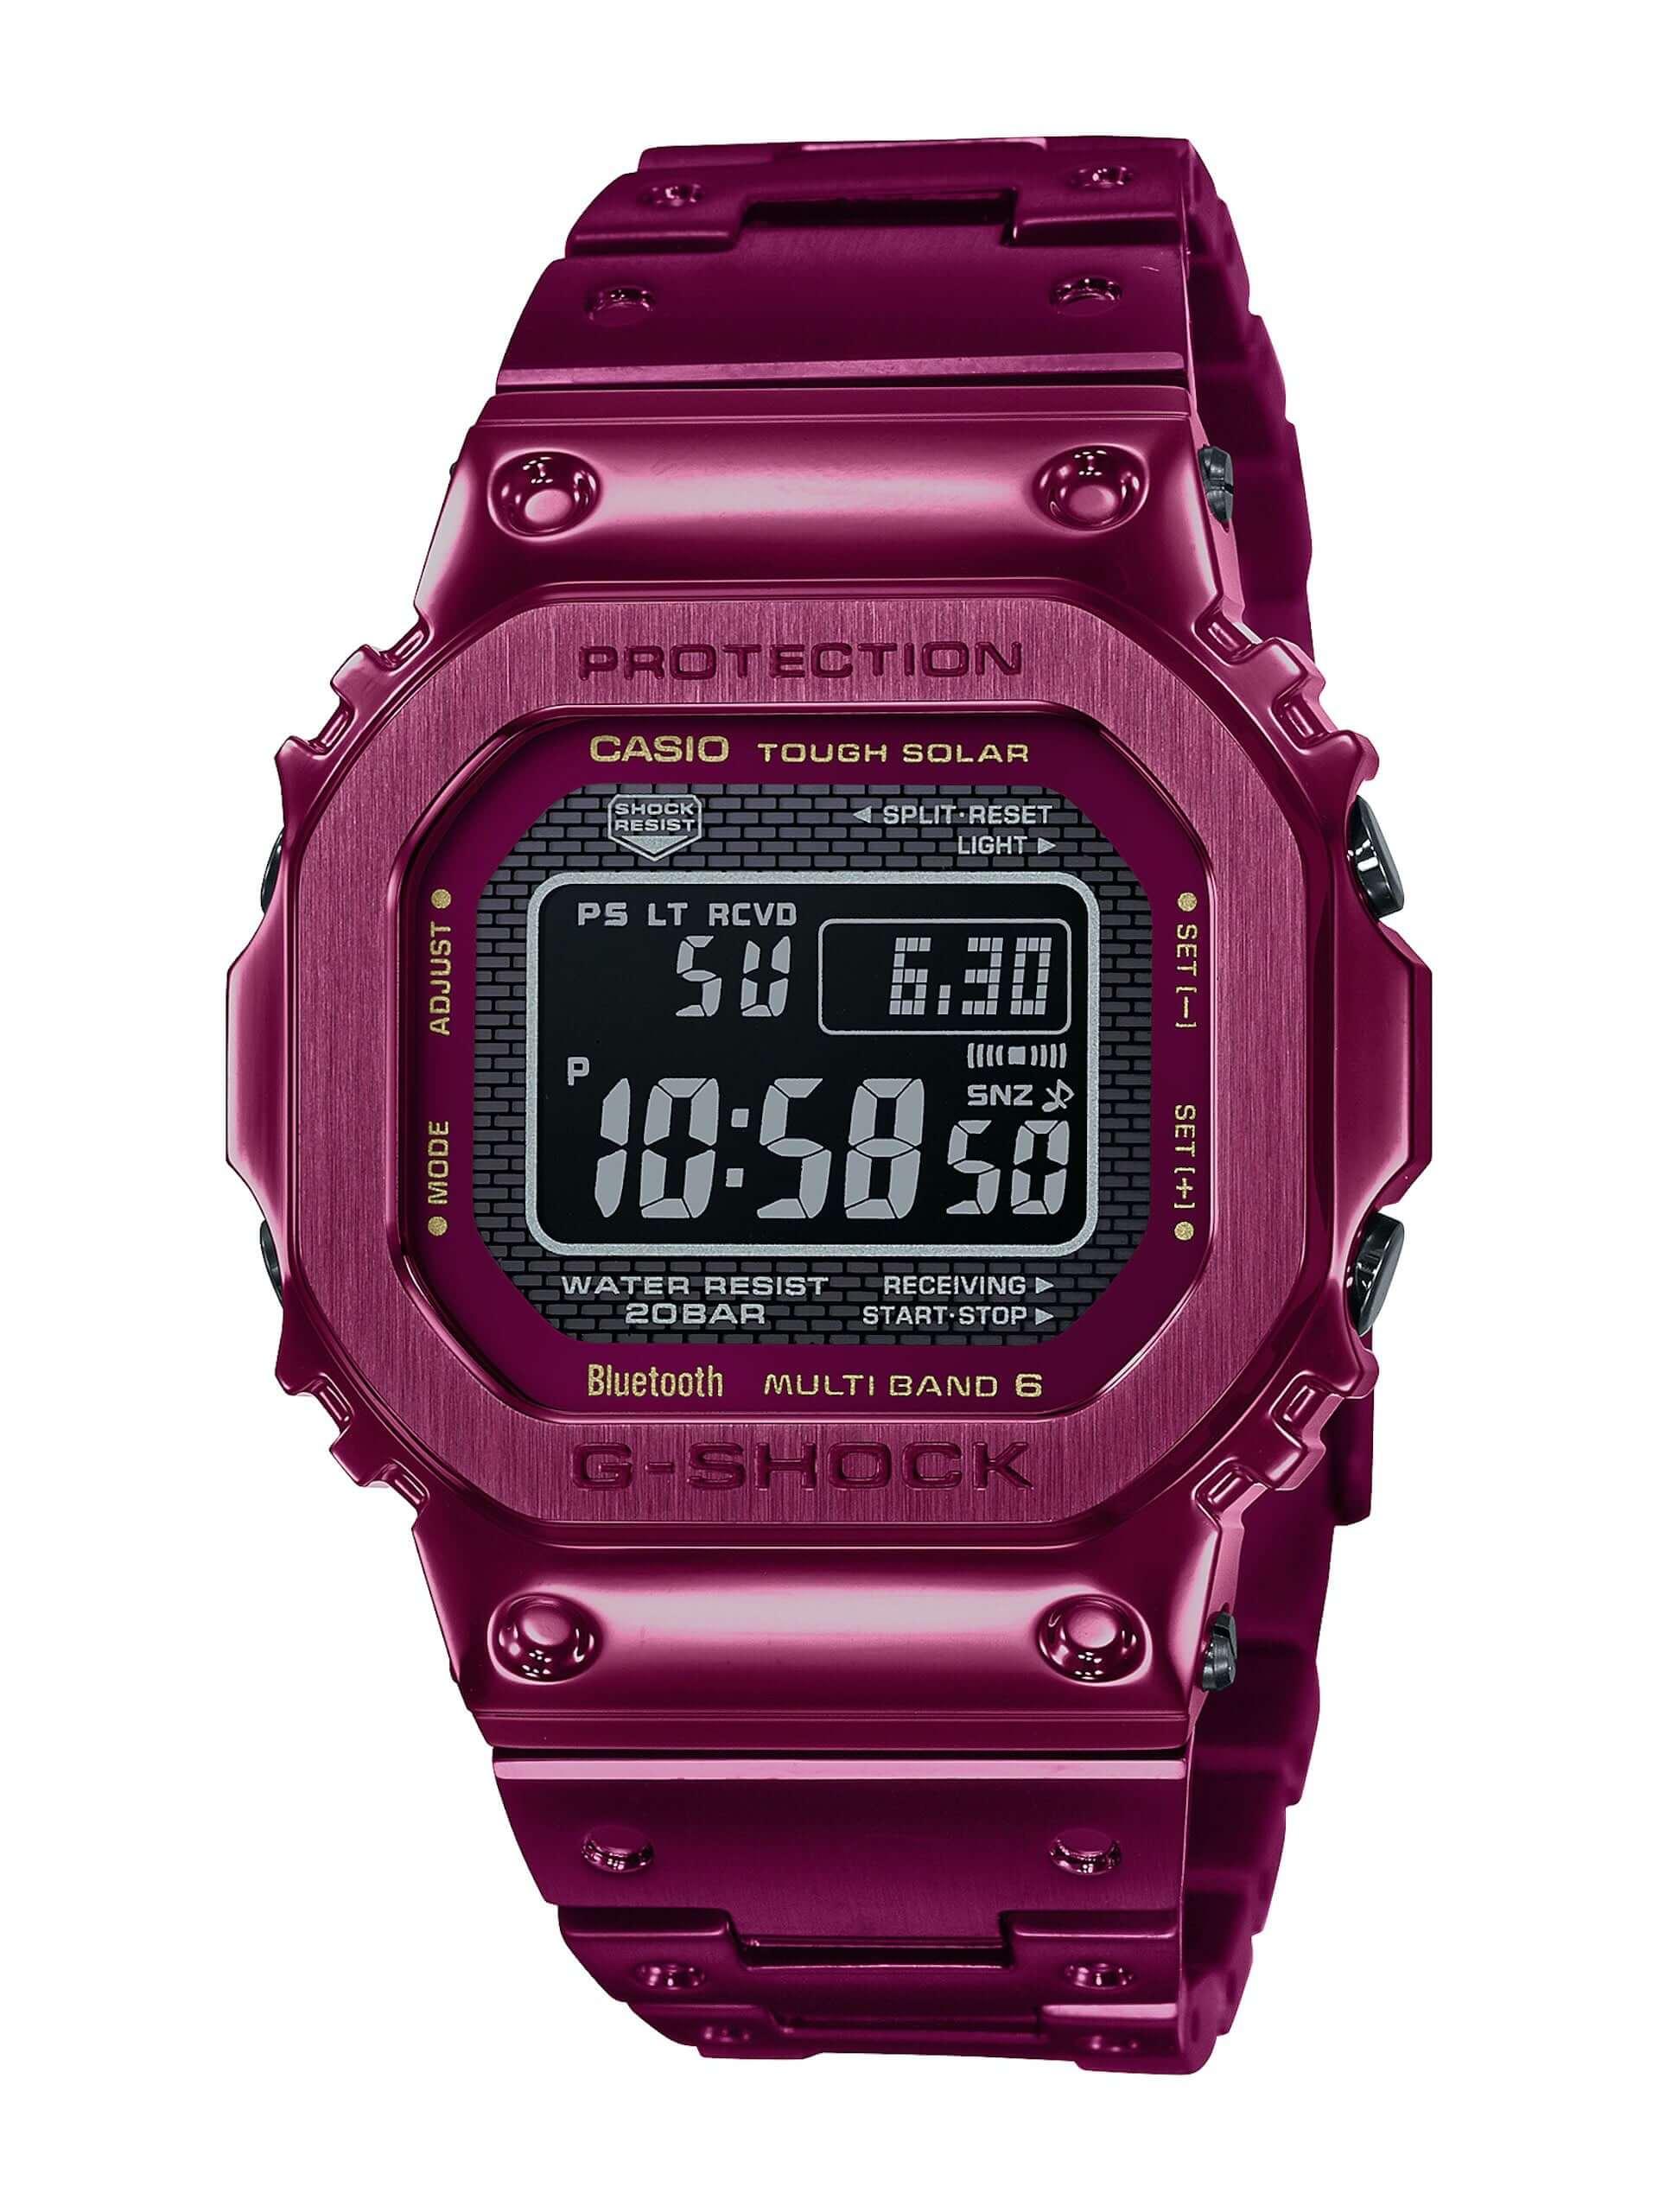 CASIOからG-SHOCK『GBD-100』『GMW-B5000』の新色やPRO TREK『PRG-240』の新モデルなど続々登場!1月発売の新製品ラインナップが発表 tech210118_casio_19-1920x2560